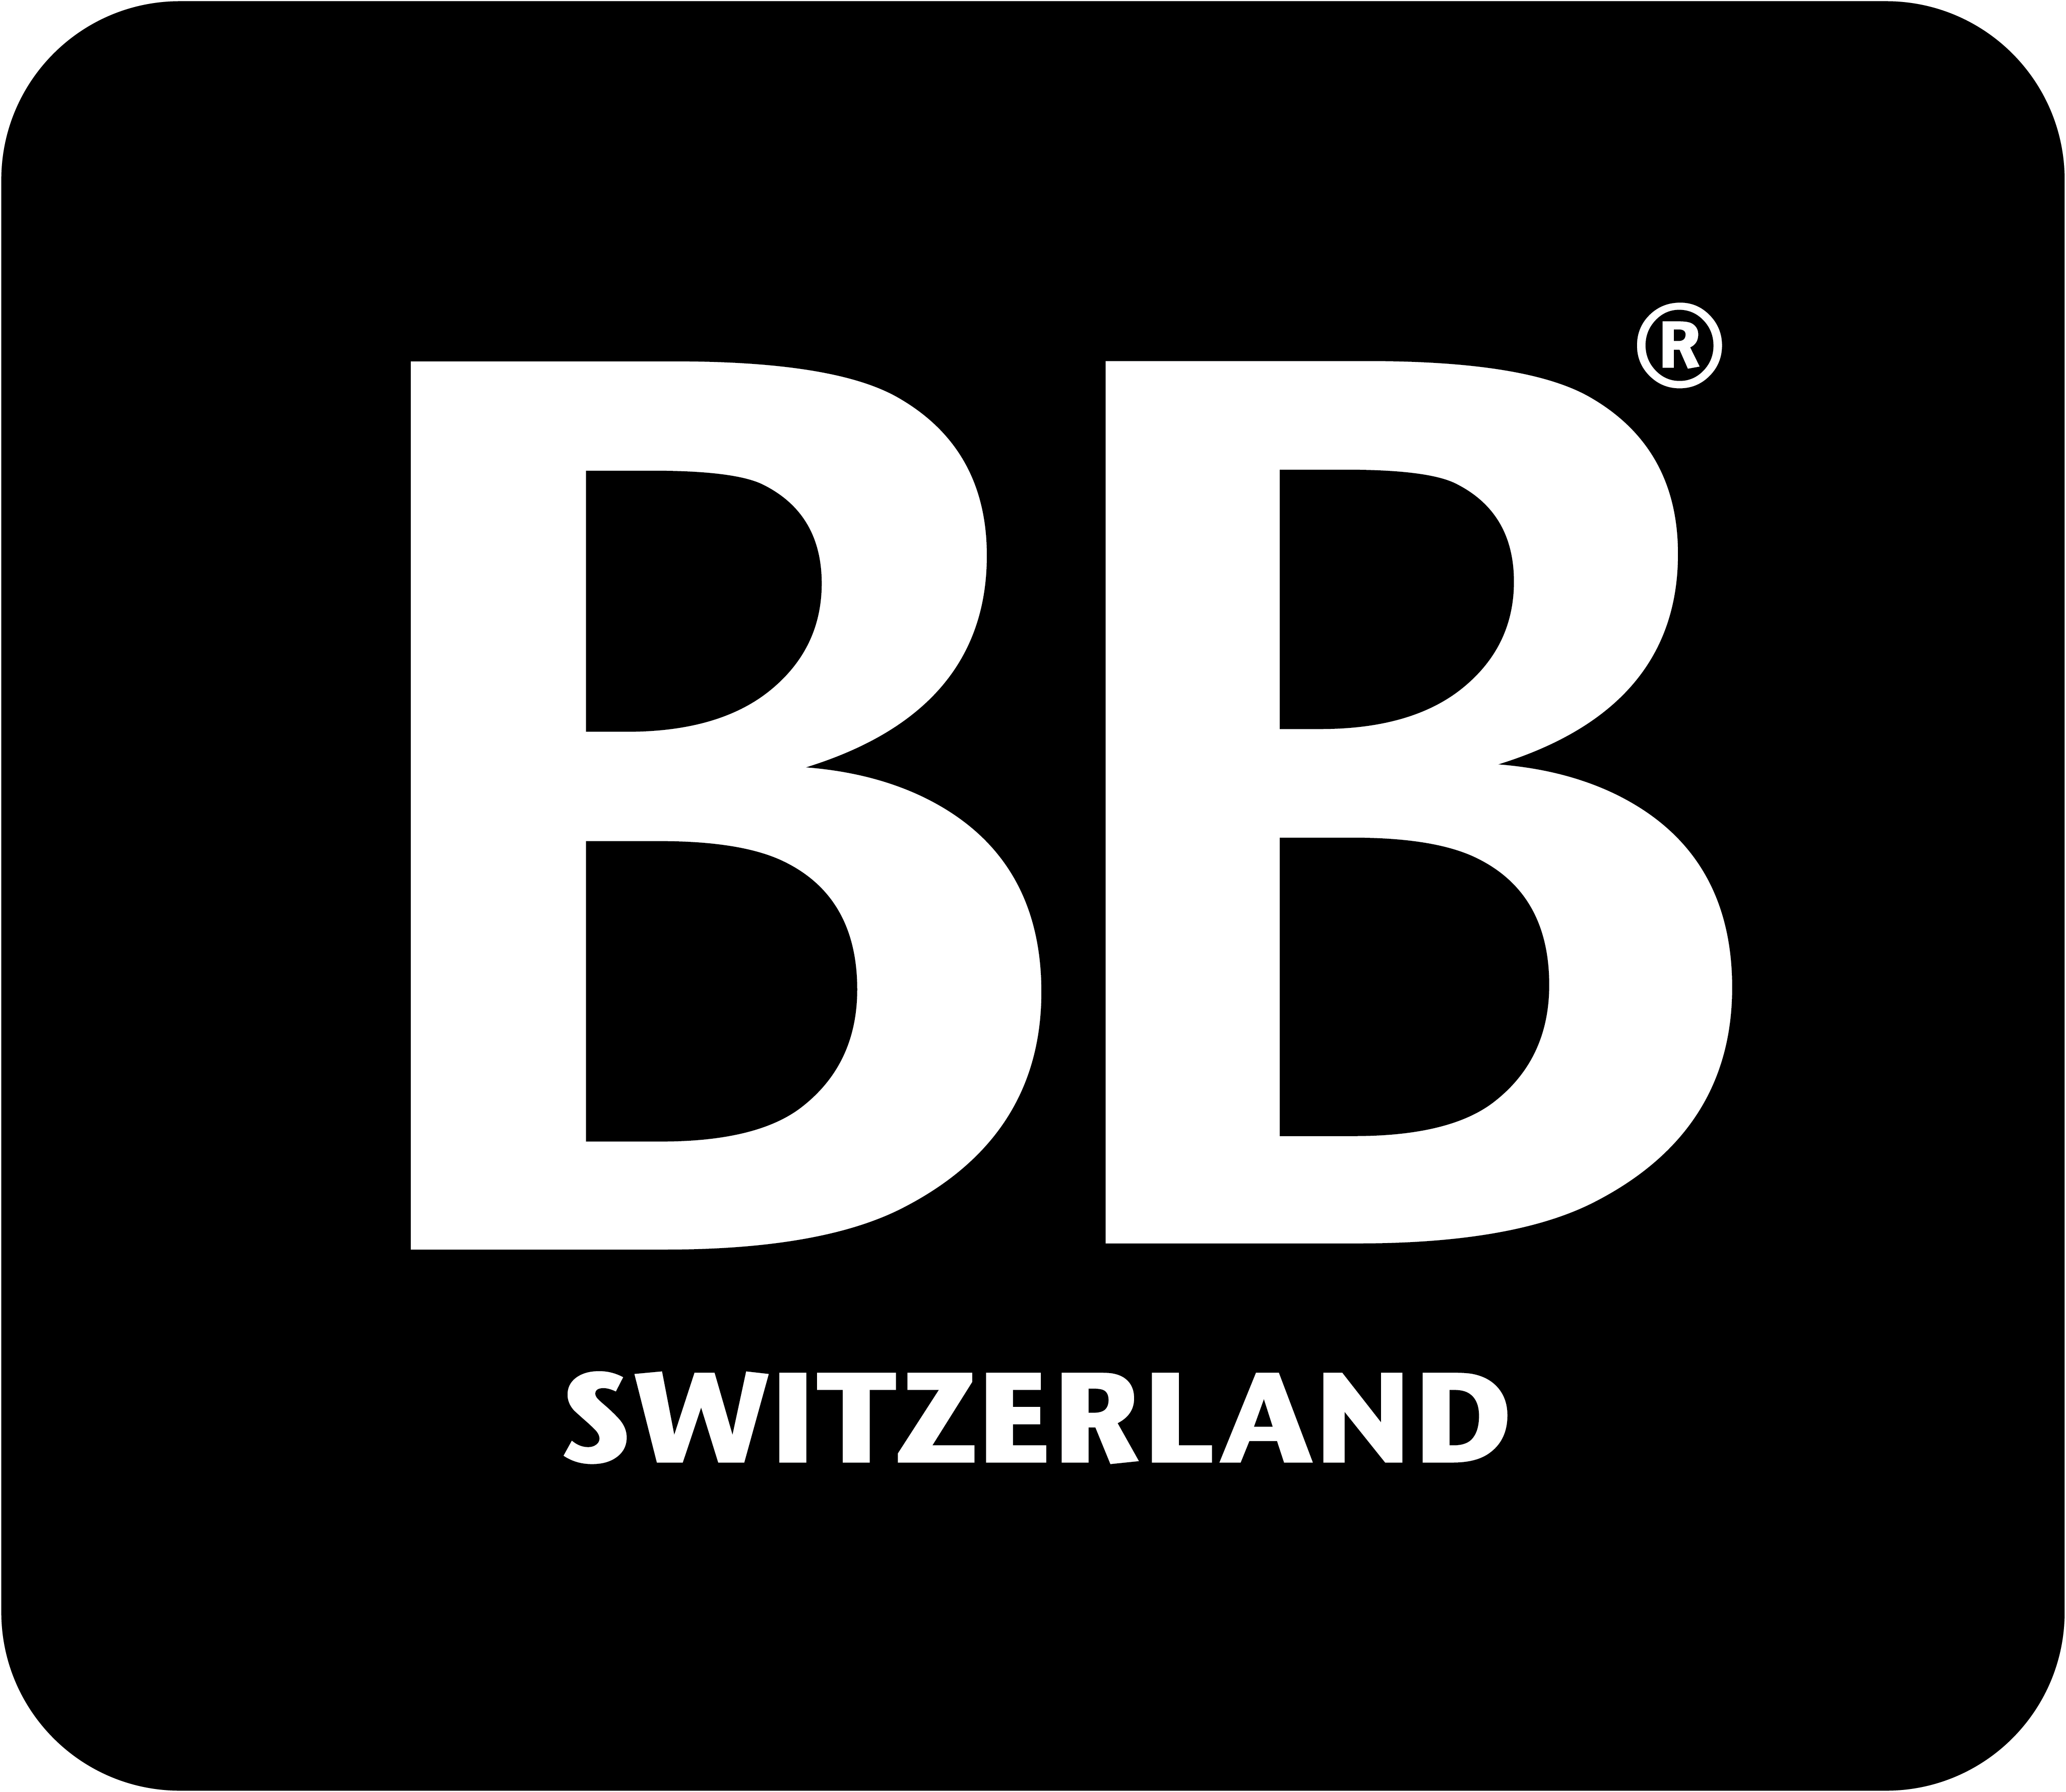 Agence BB Switzerland